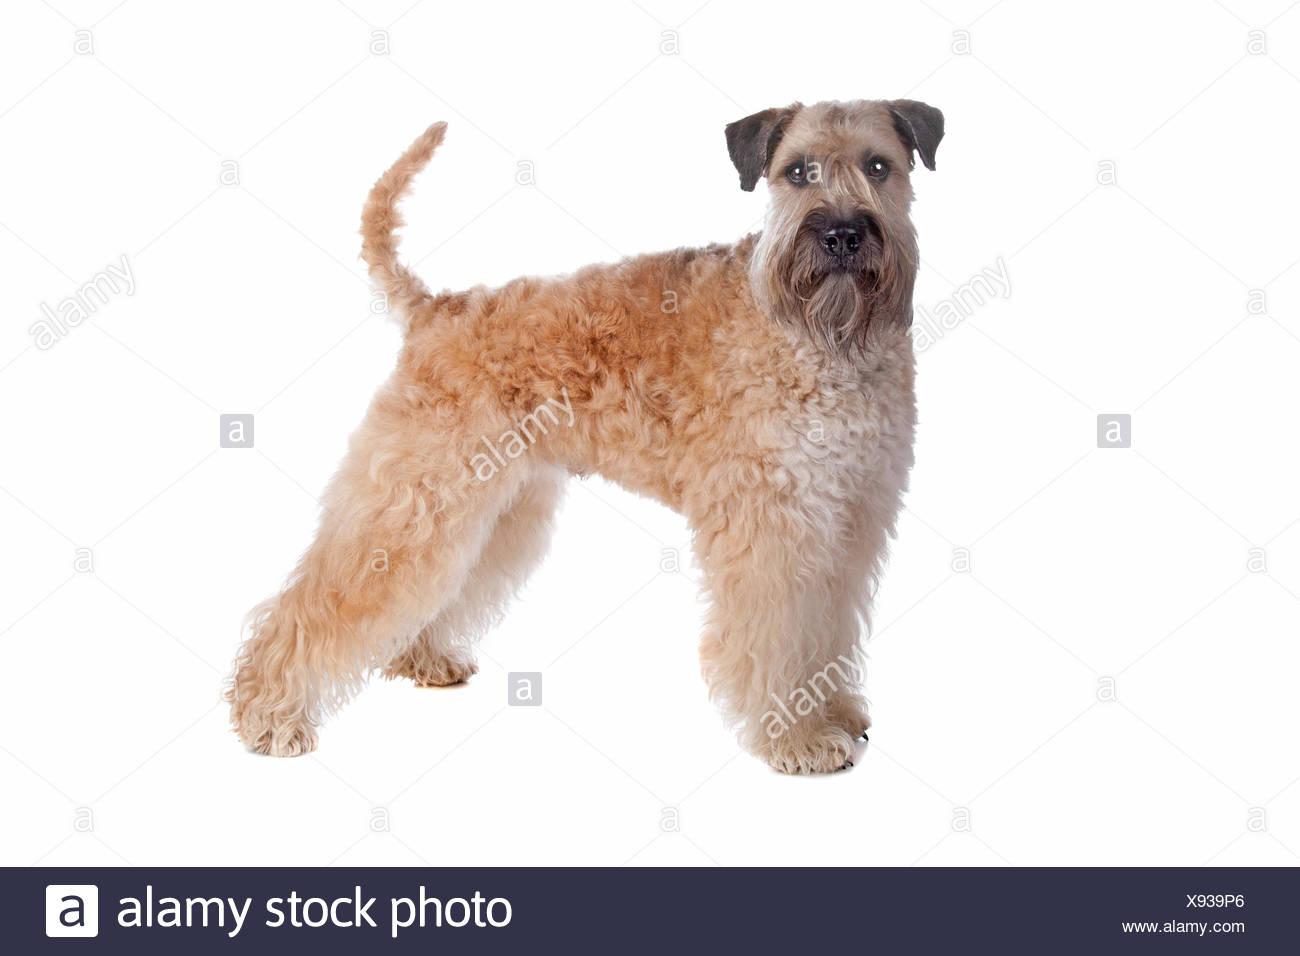 Wheaten Terrier Dog Stock Photos Wheaten Terrier Dog Stock Images